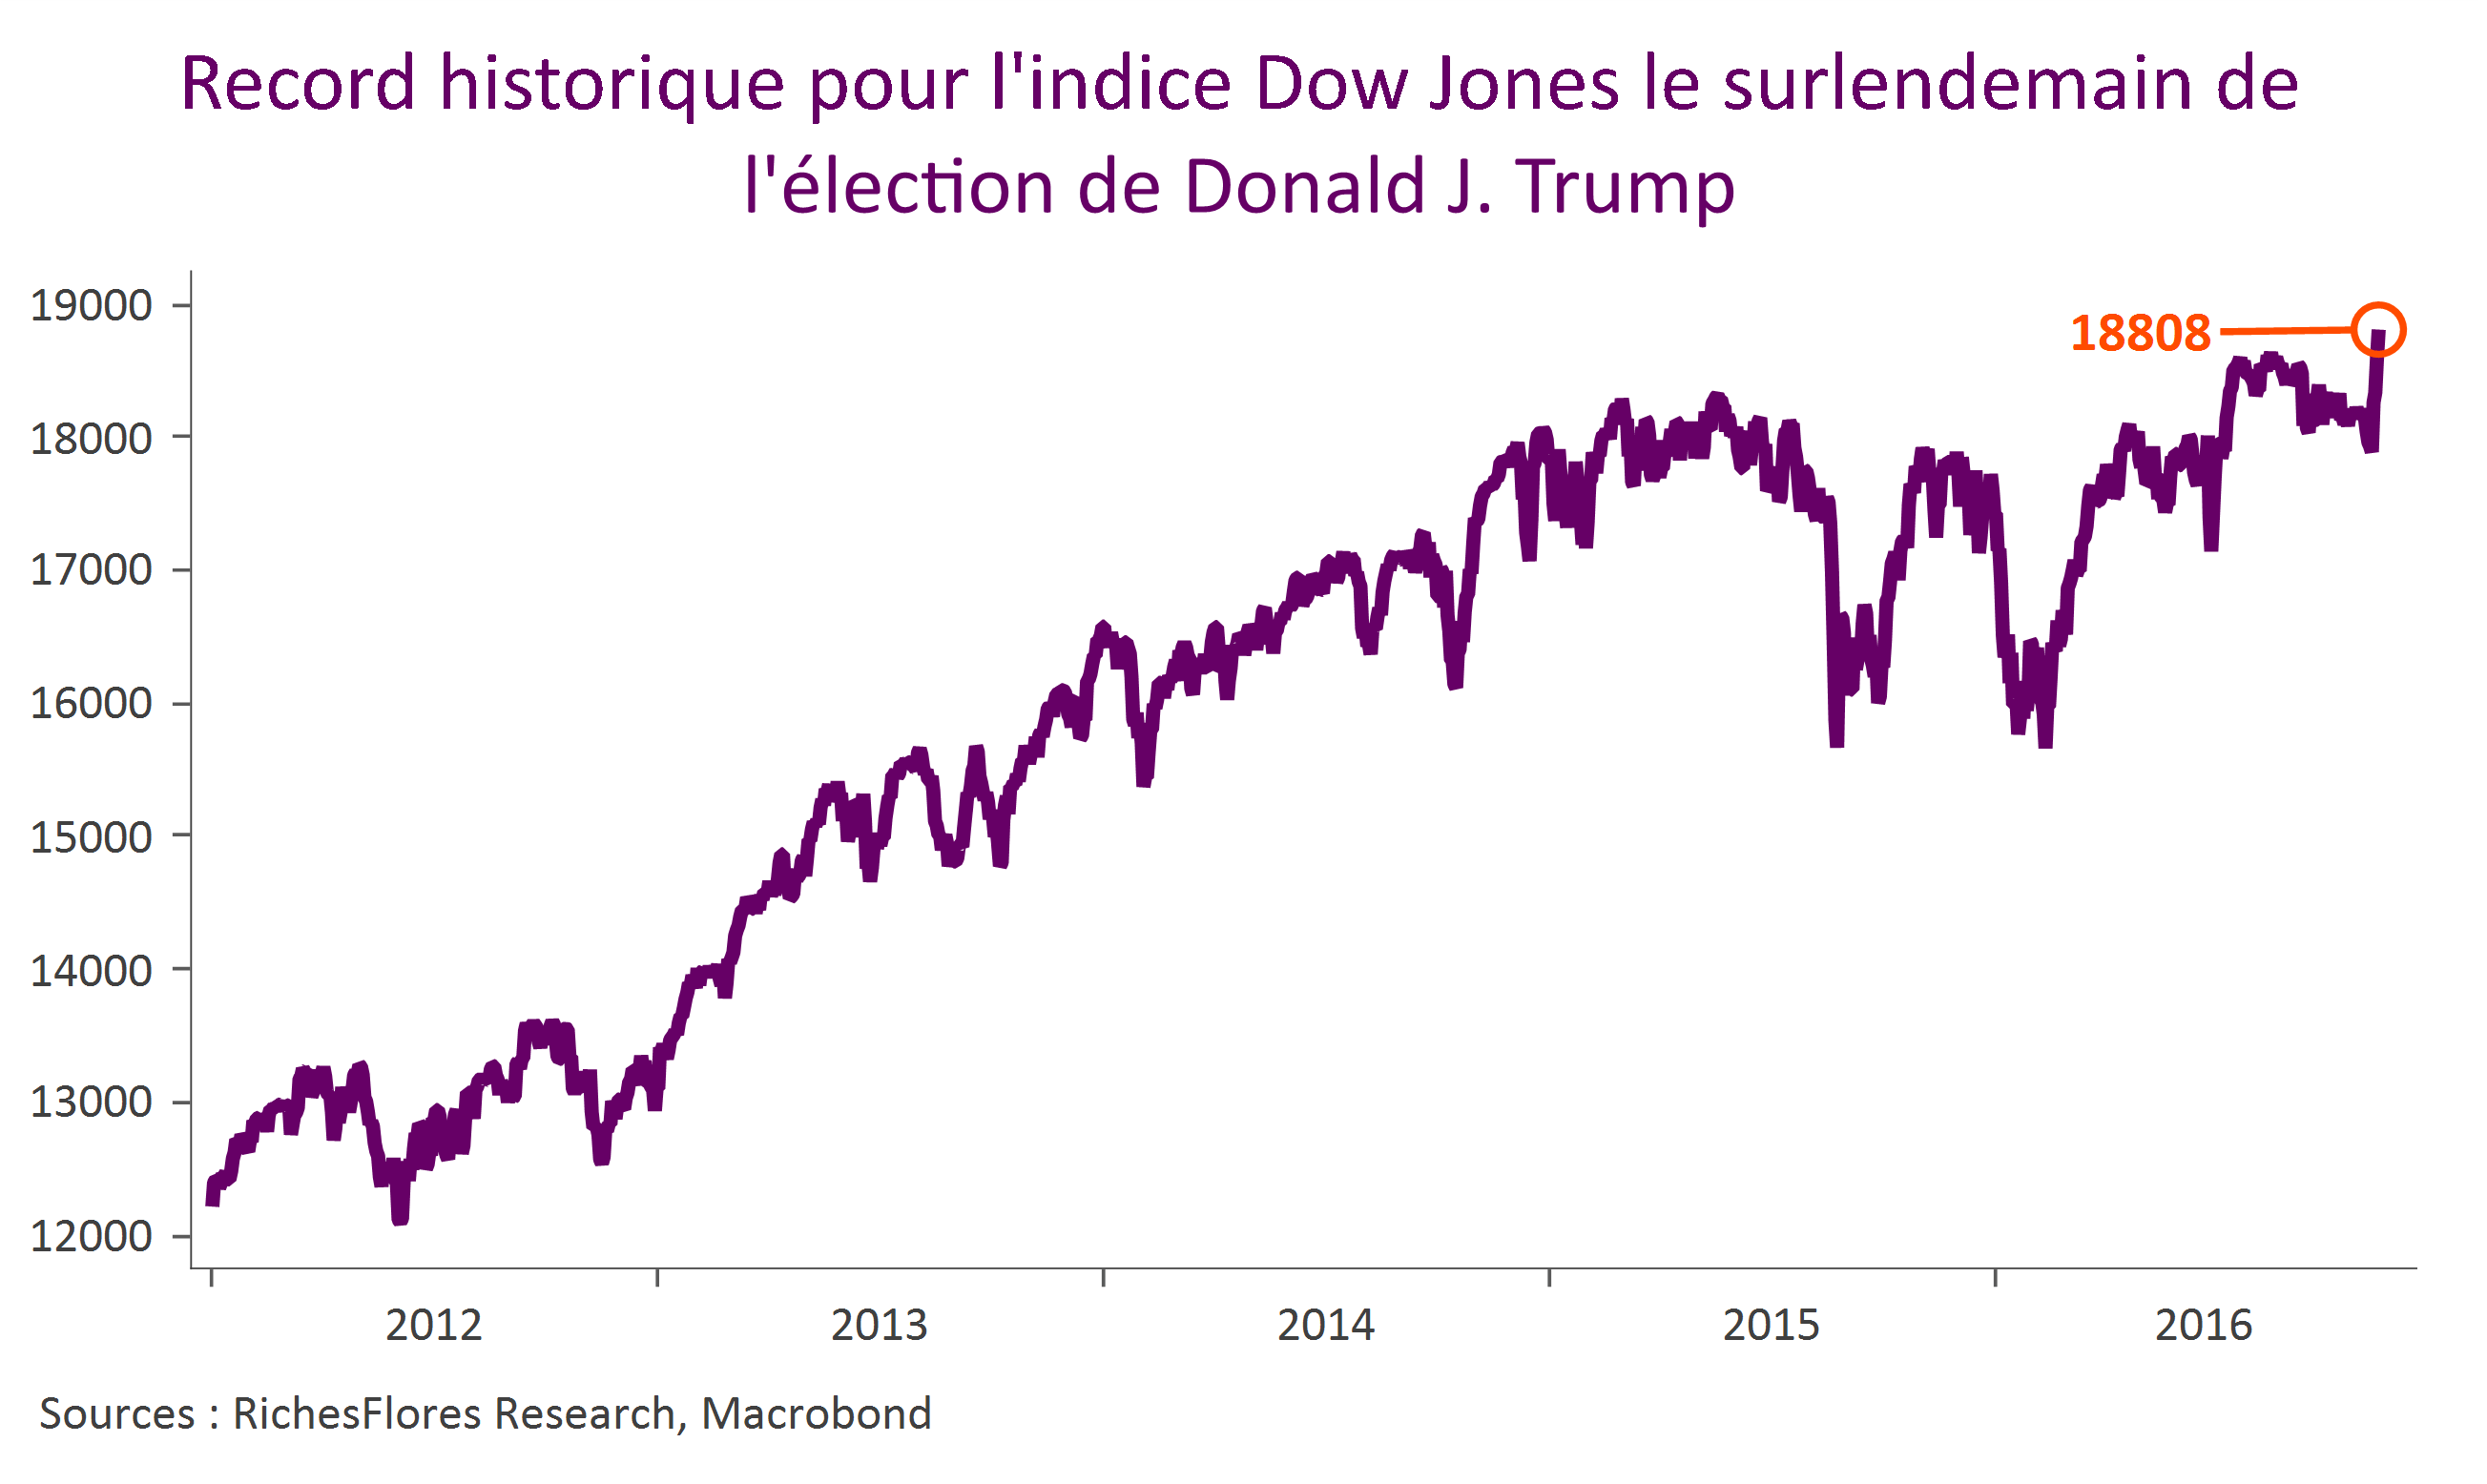 Dow Jones post Trump election